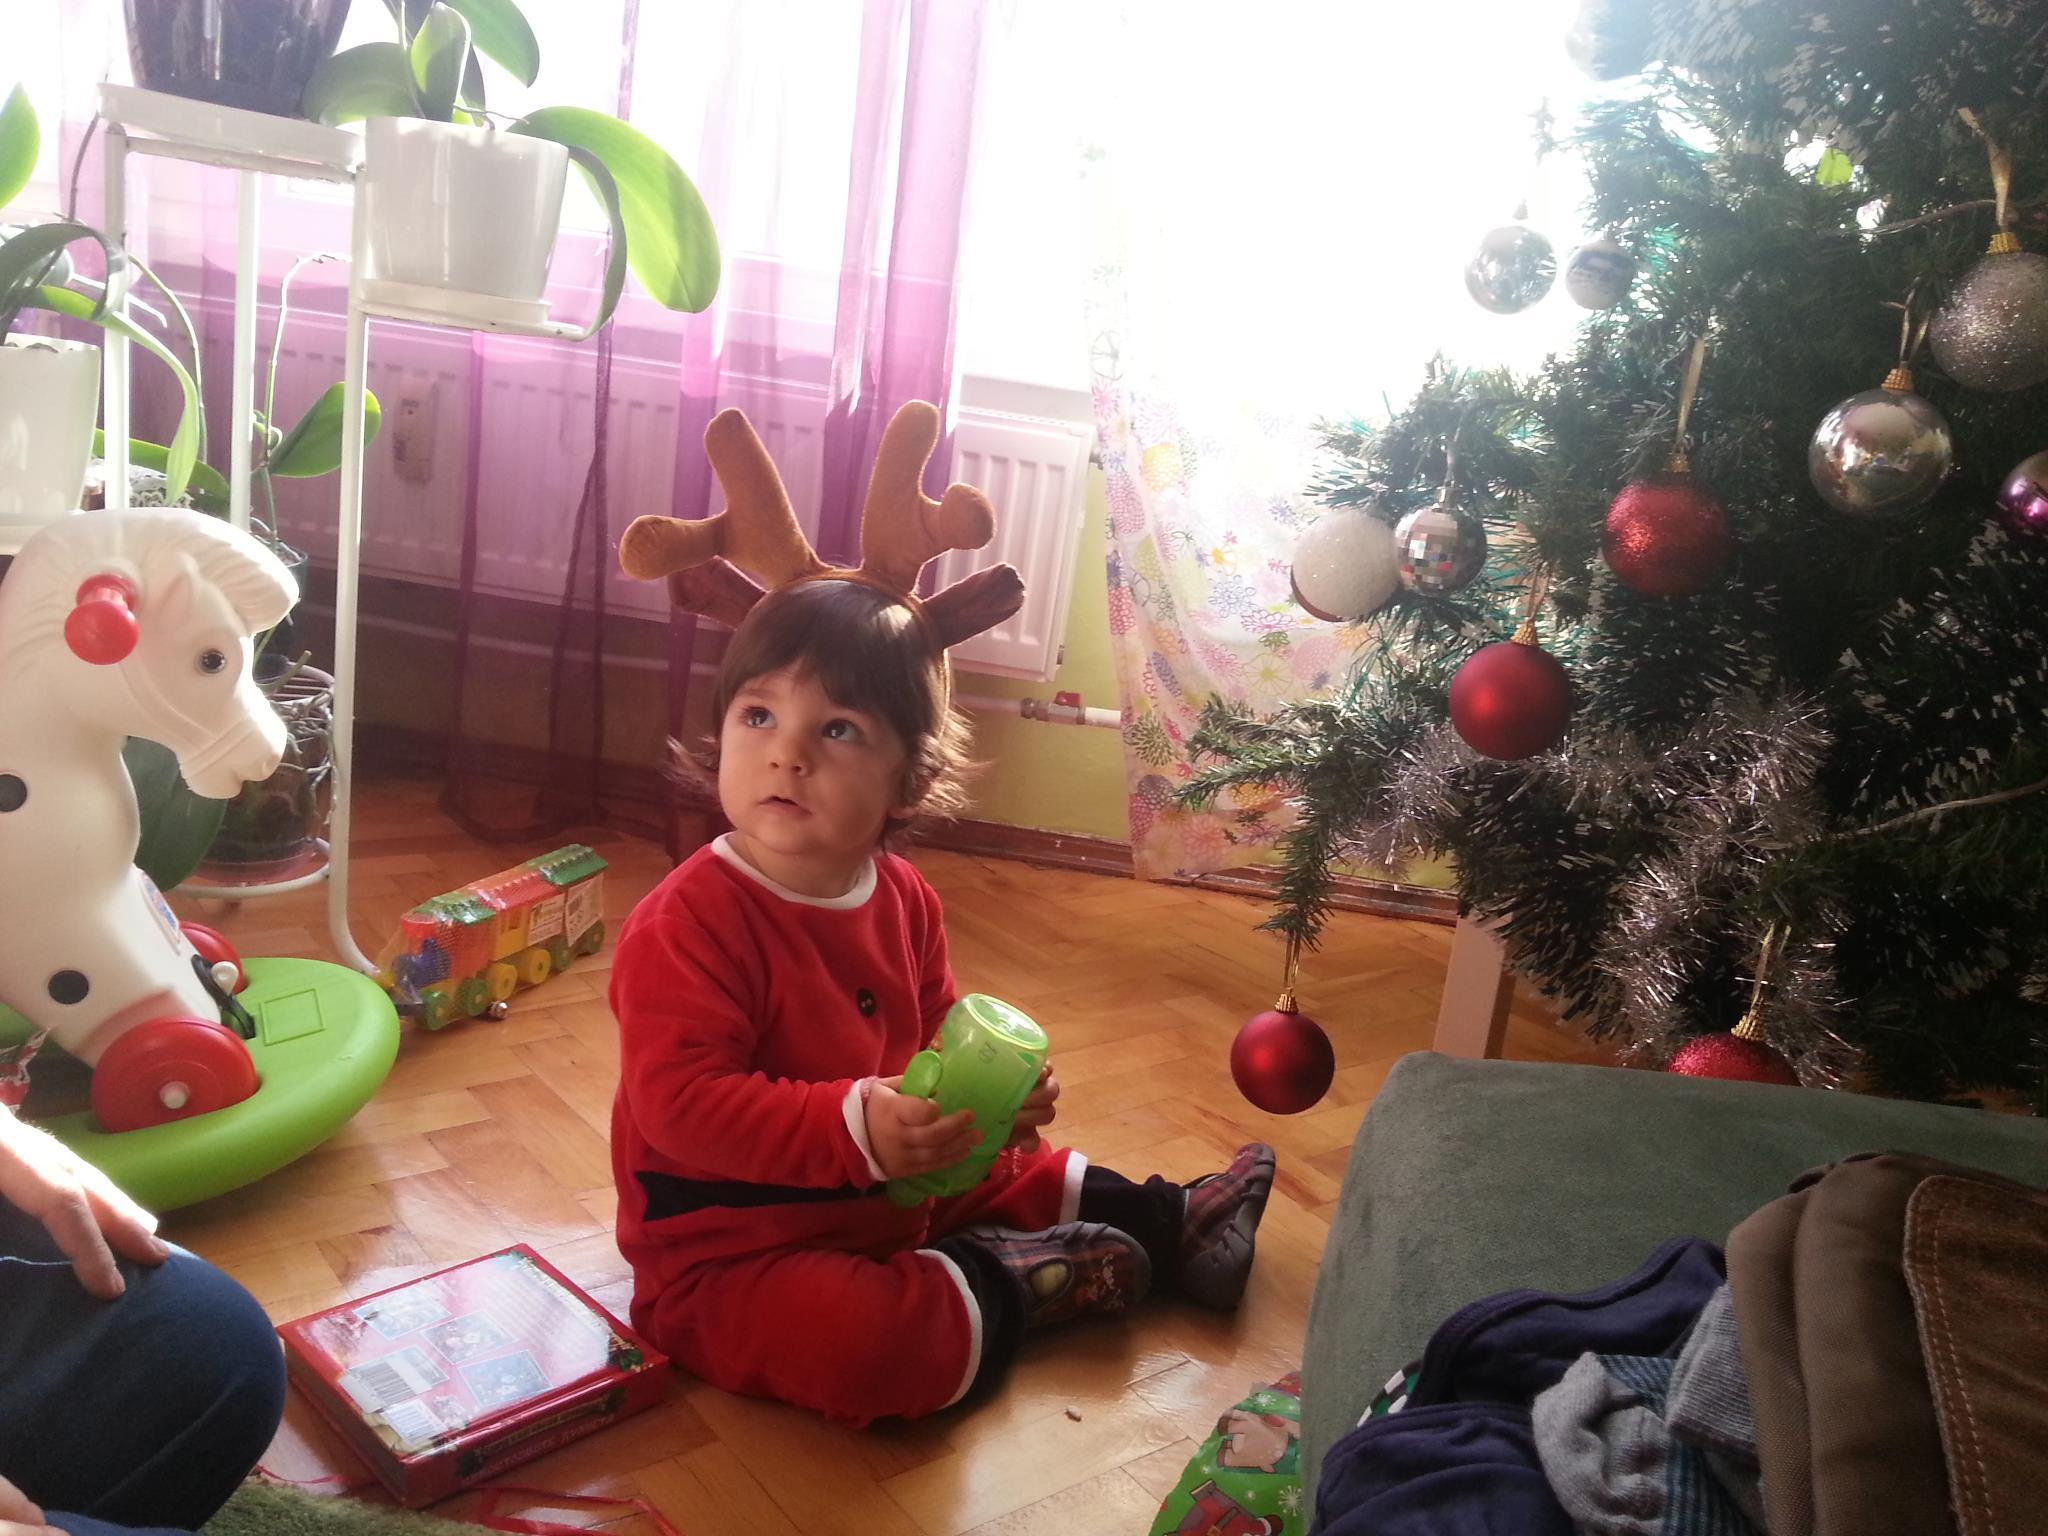 Maria Antonova 04.12.2012 1